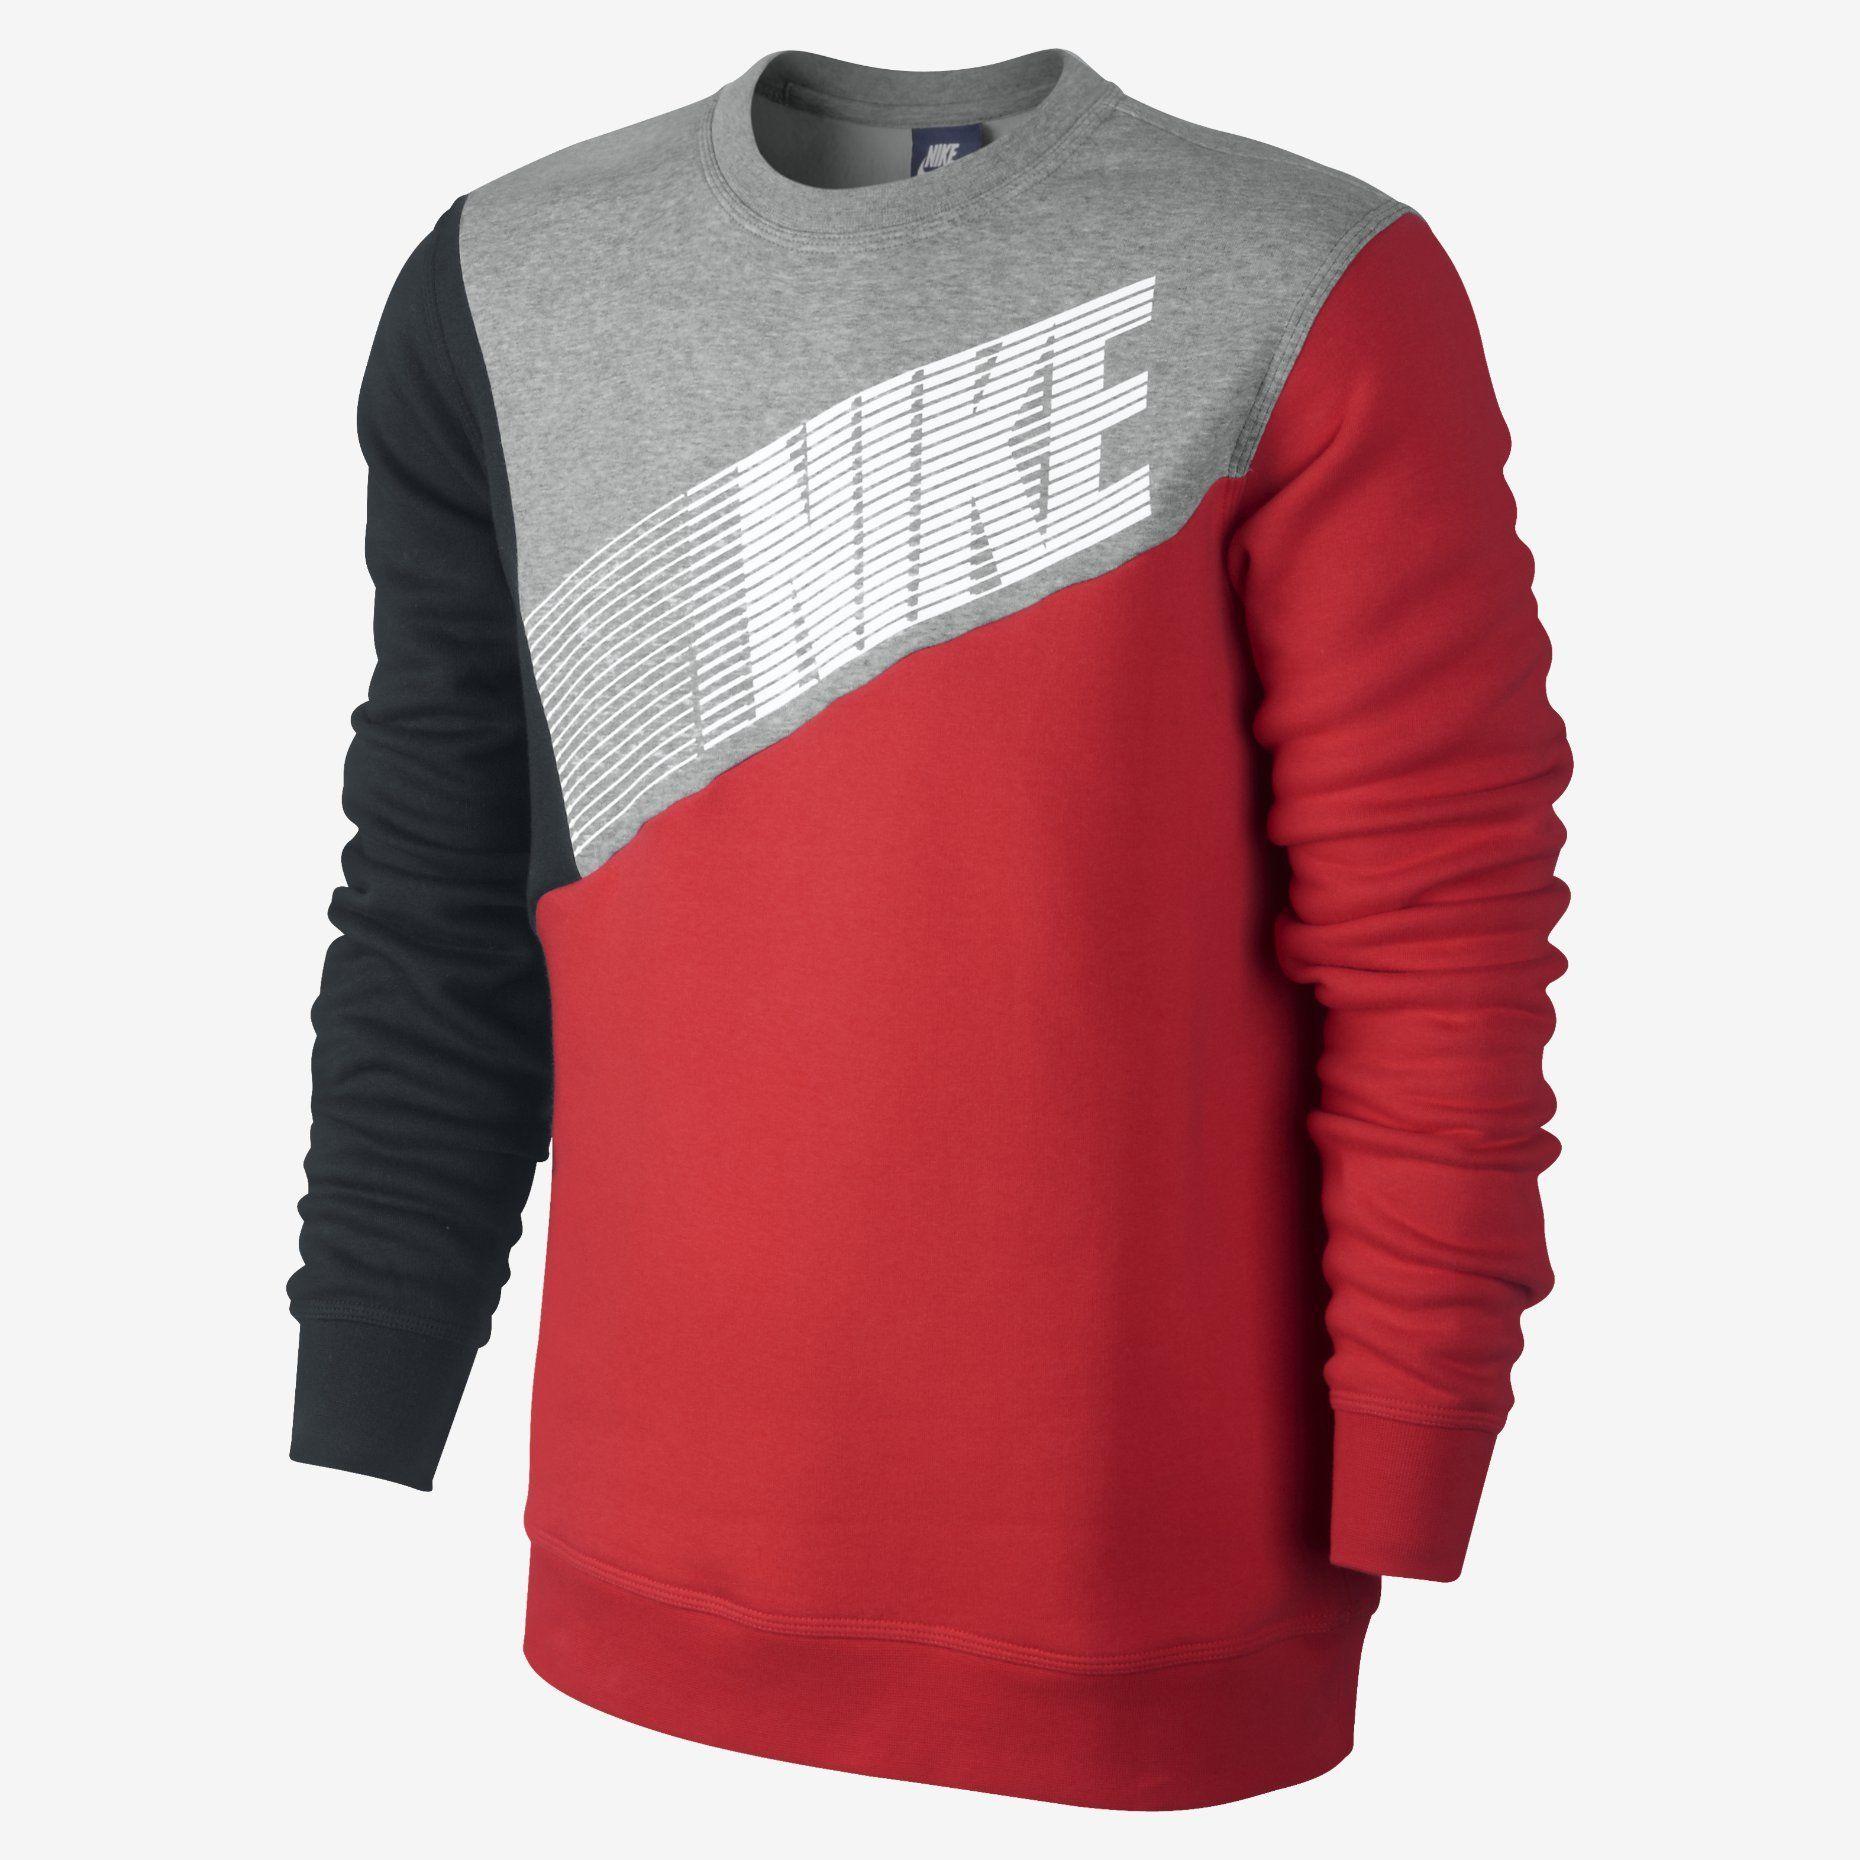 Nike Club Crew Color Block Mens Sweatshirt Nike Store Mens Sweatshirts Mens Outfits Sweatshirts [ 1860 x 1860 Pixel ]